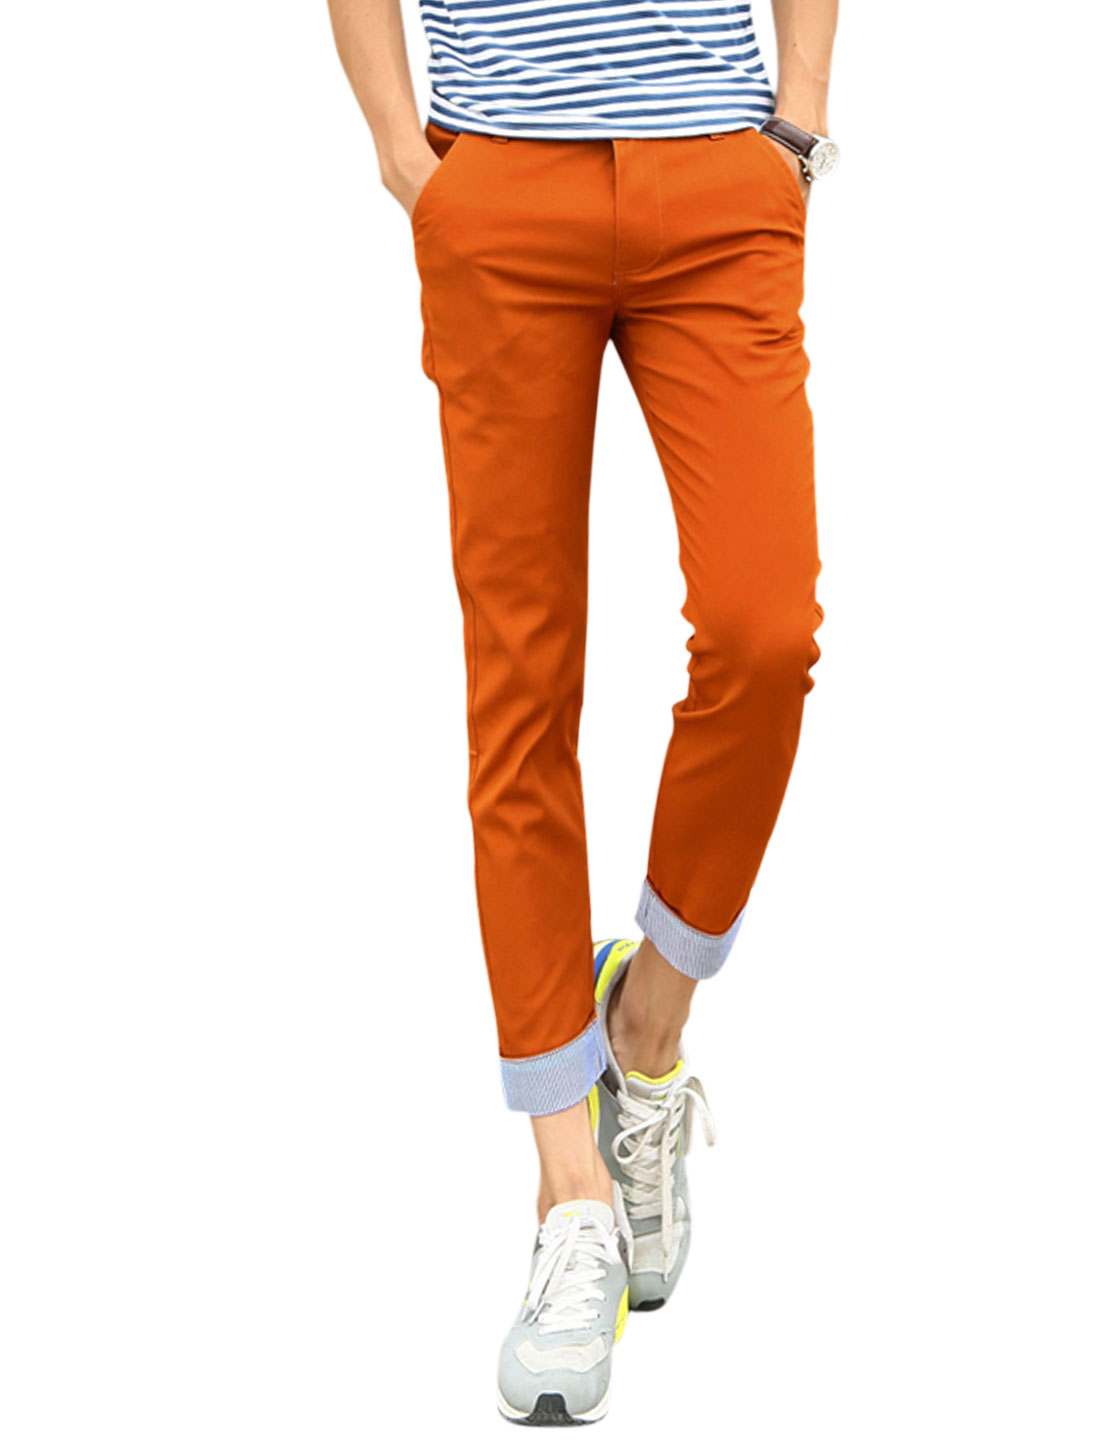 Men Mid Rise Stripes Cuffs Casual Crop Pants Rust W30